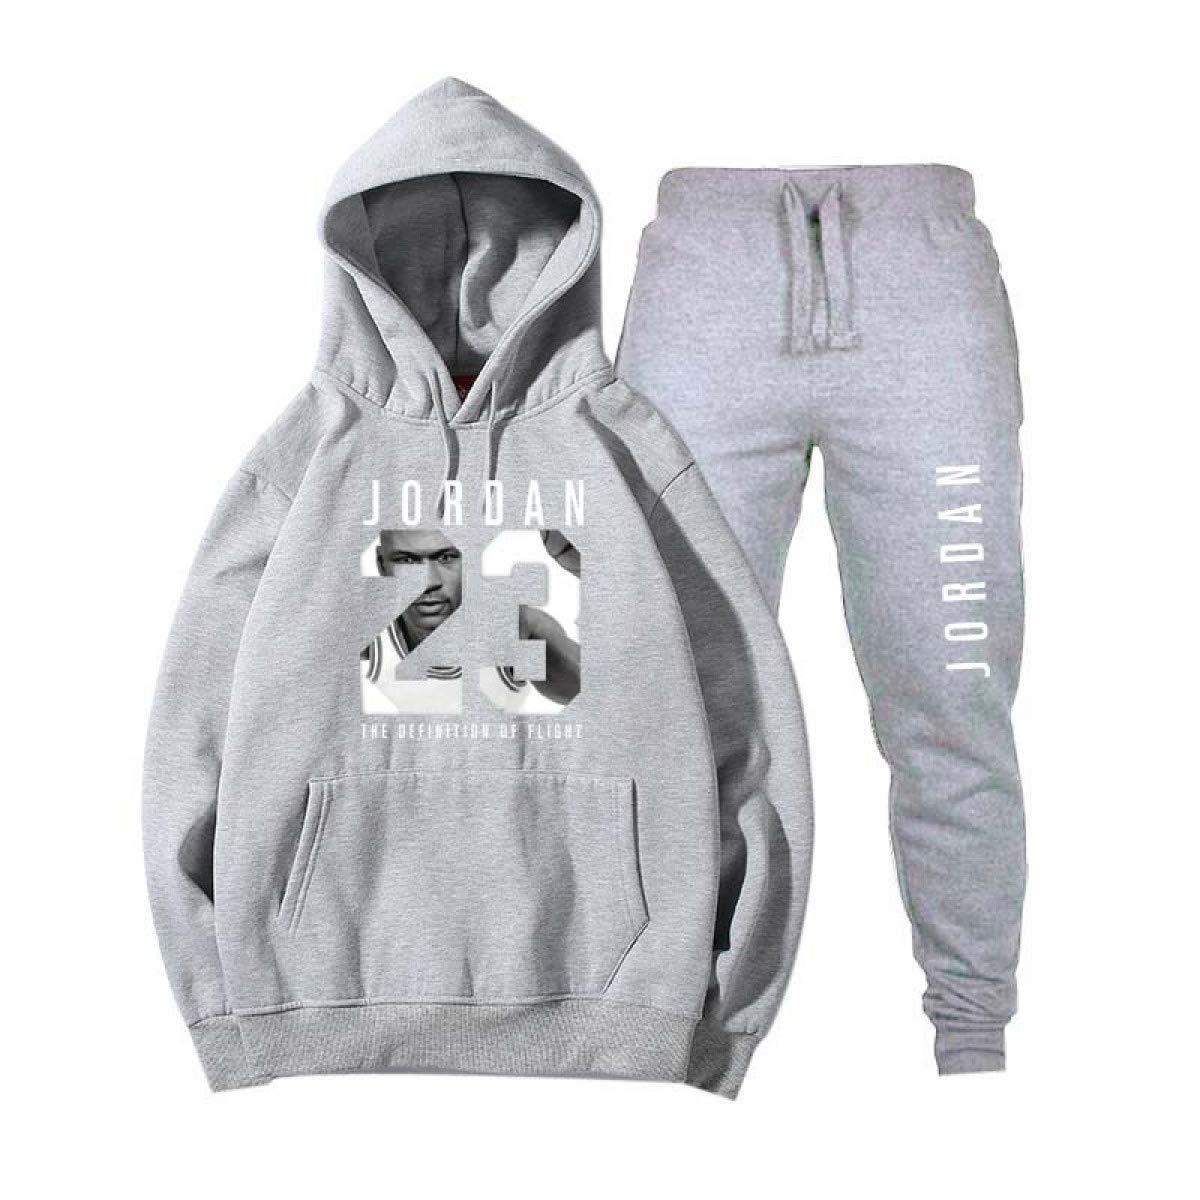 1cd239fc Amazon.com: Jordan 23 Men Sportswear Men Hoodie Pullover Mens Tracksuit  Sweatshirts Clothing: Clothing